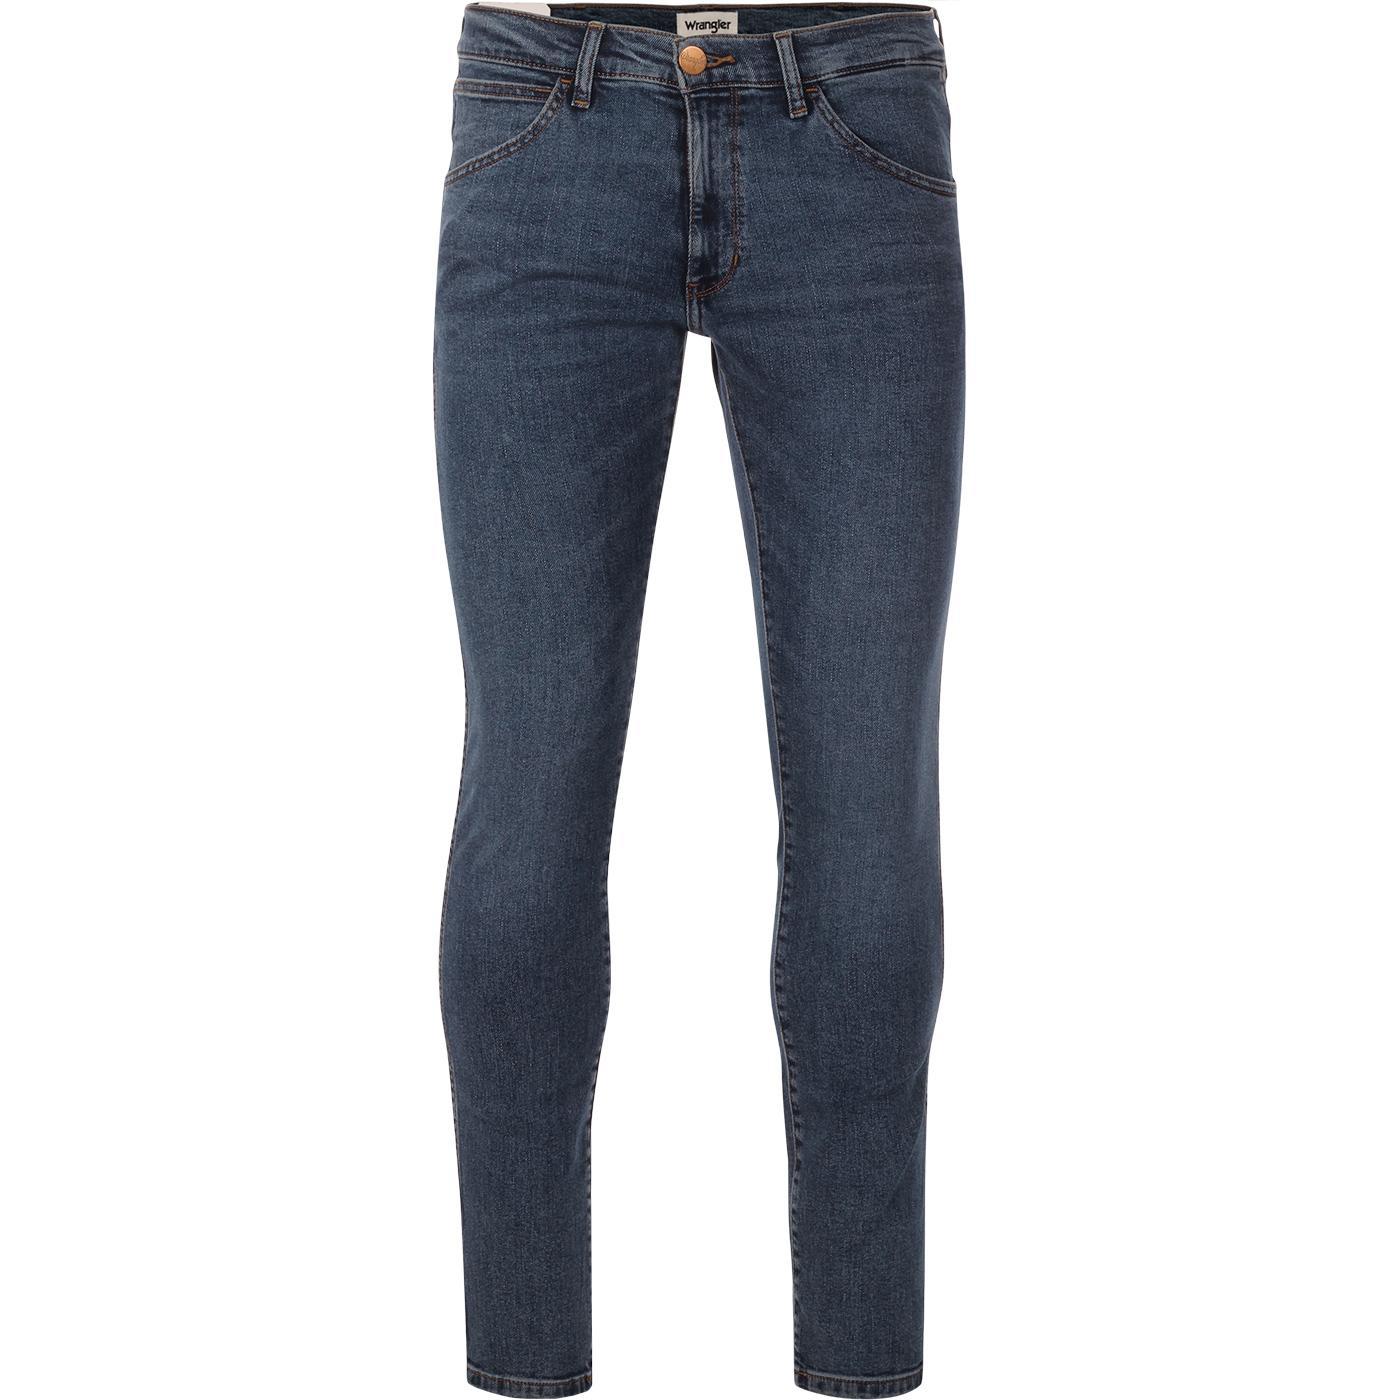 Bryson WRANGLER Retro Mod Skinny Jeans (Blue Shot)